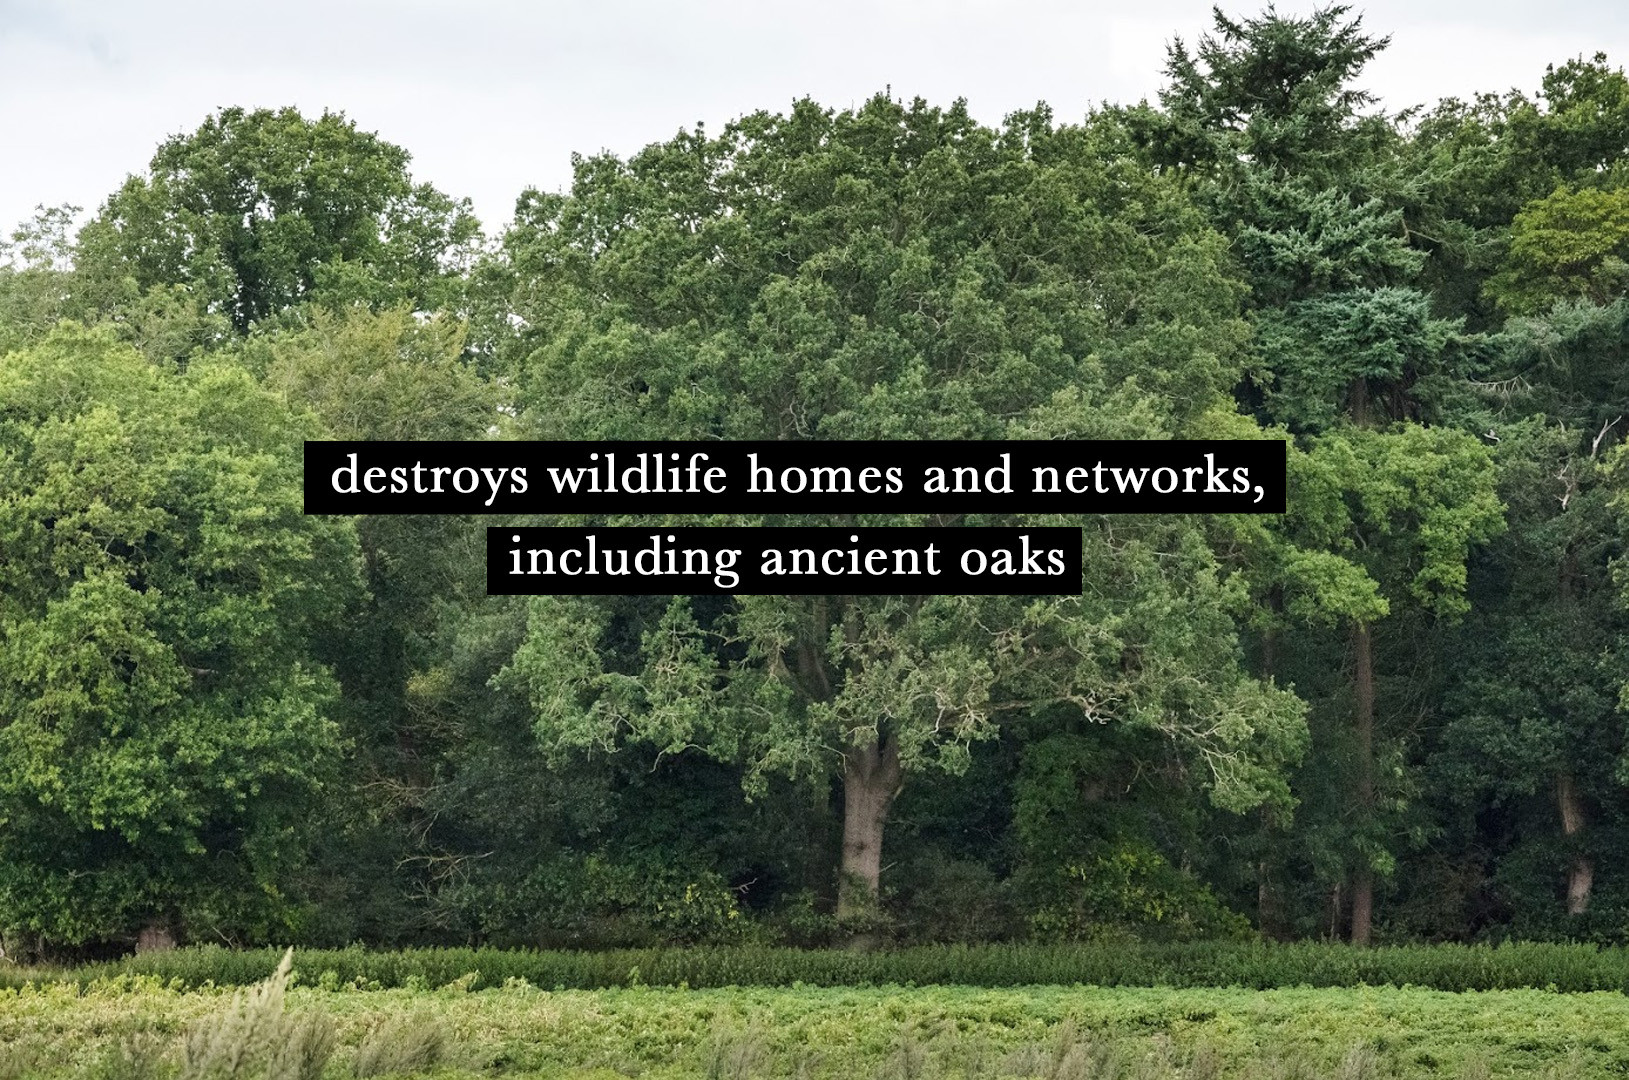 detroys ancient oaks.jpg